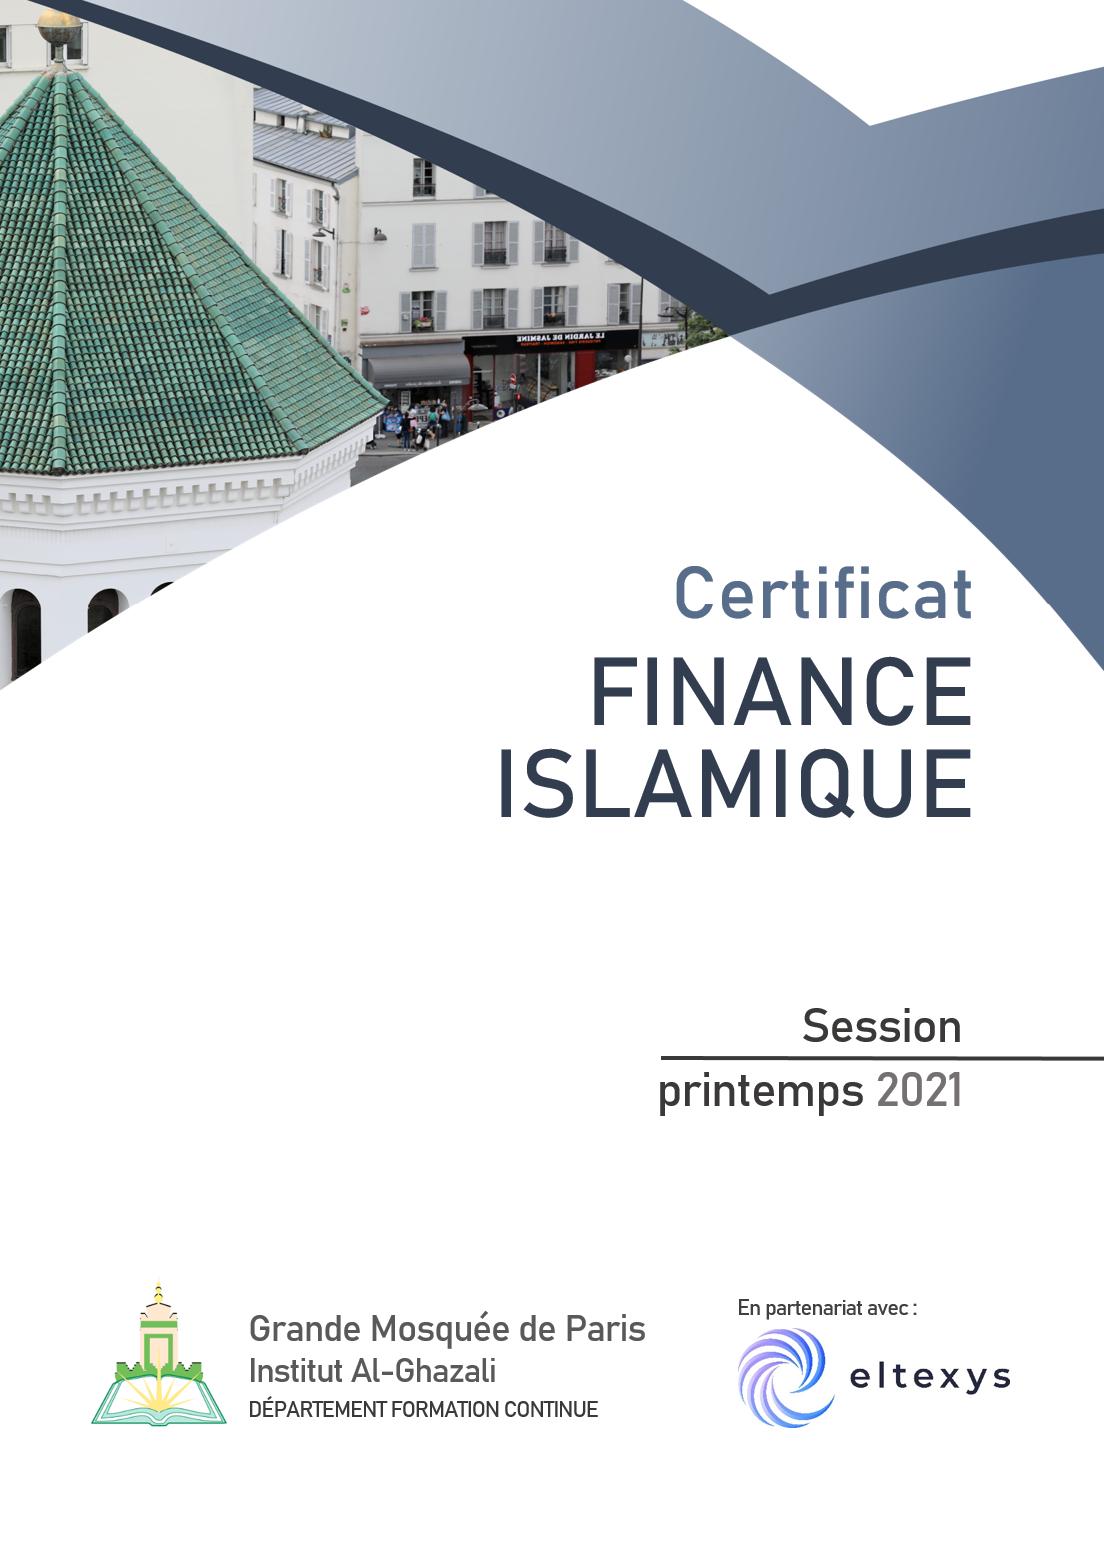 Affiche certificat finance islamique